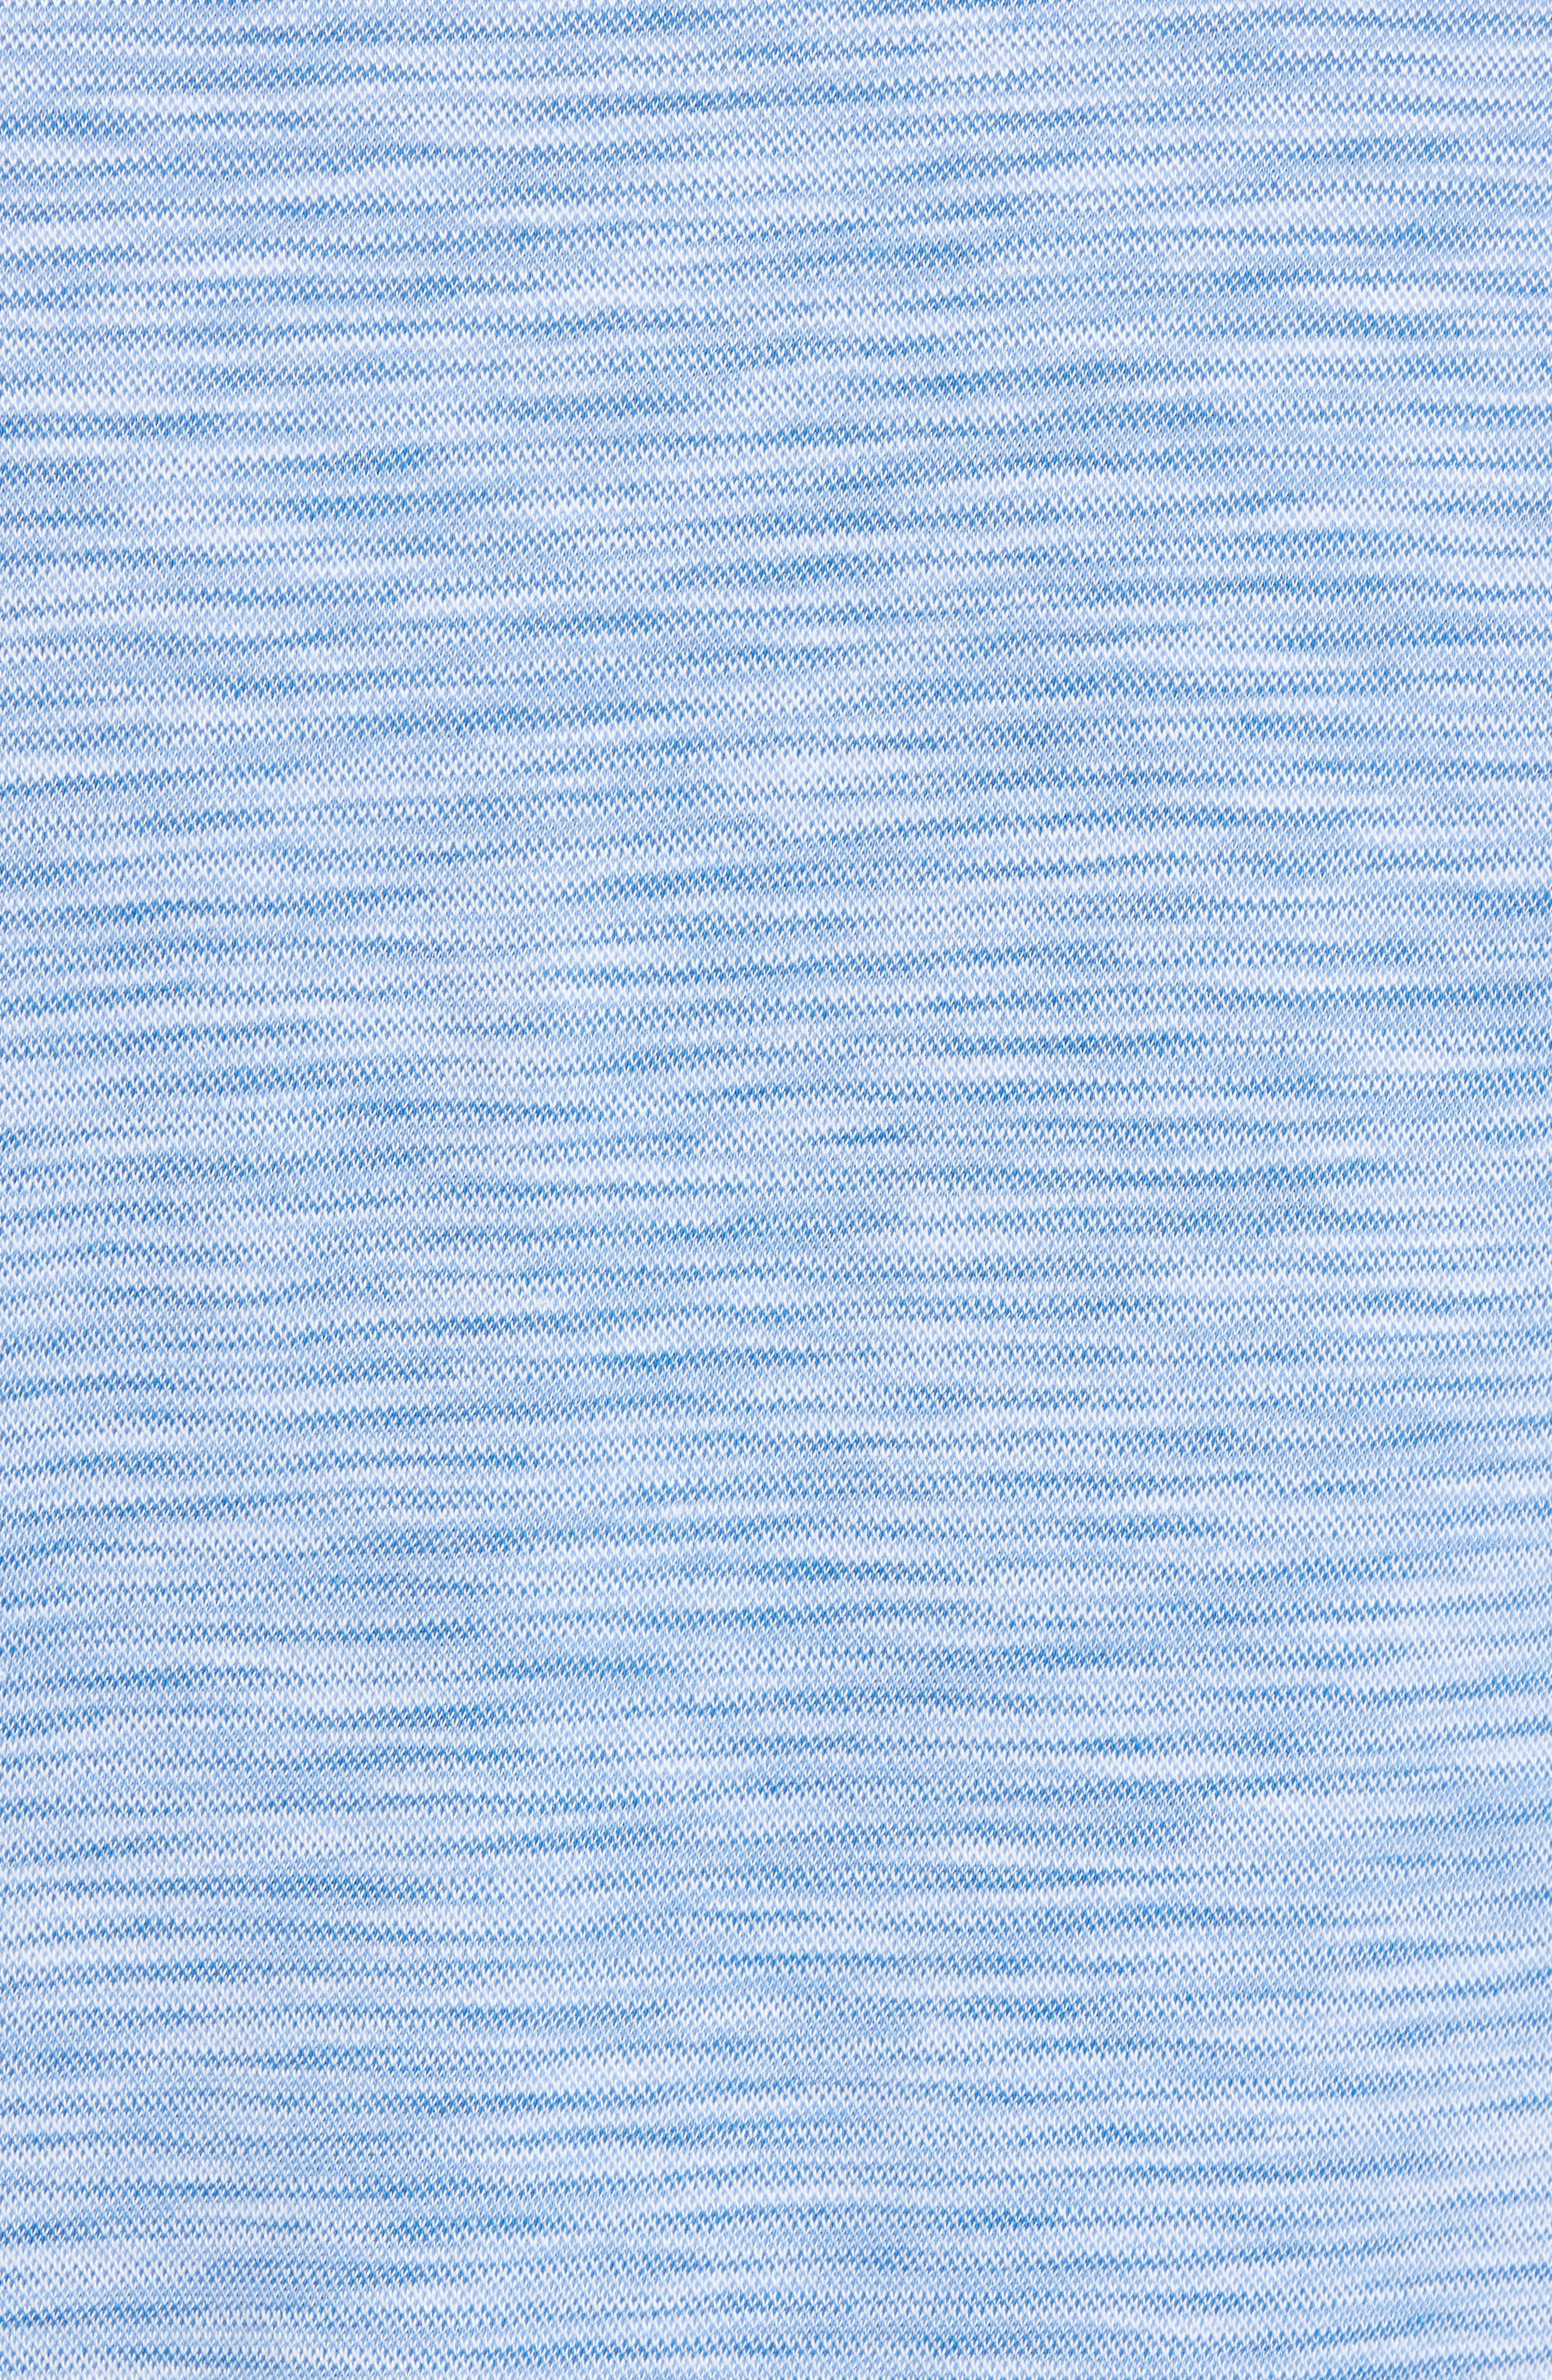 Marled Stripe Polo,                             Alternate thumbnail 5, color,                             CLASSIC BLUE